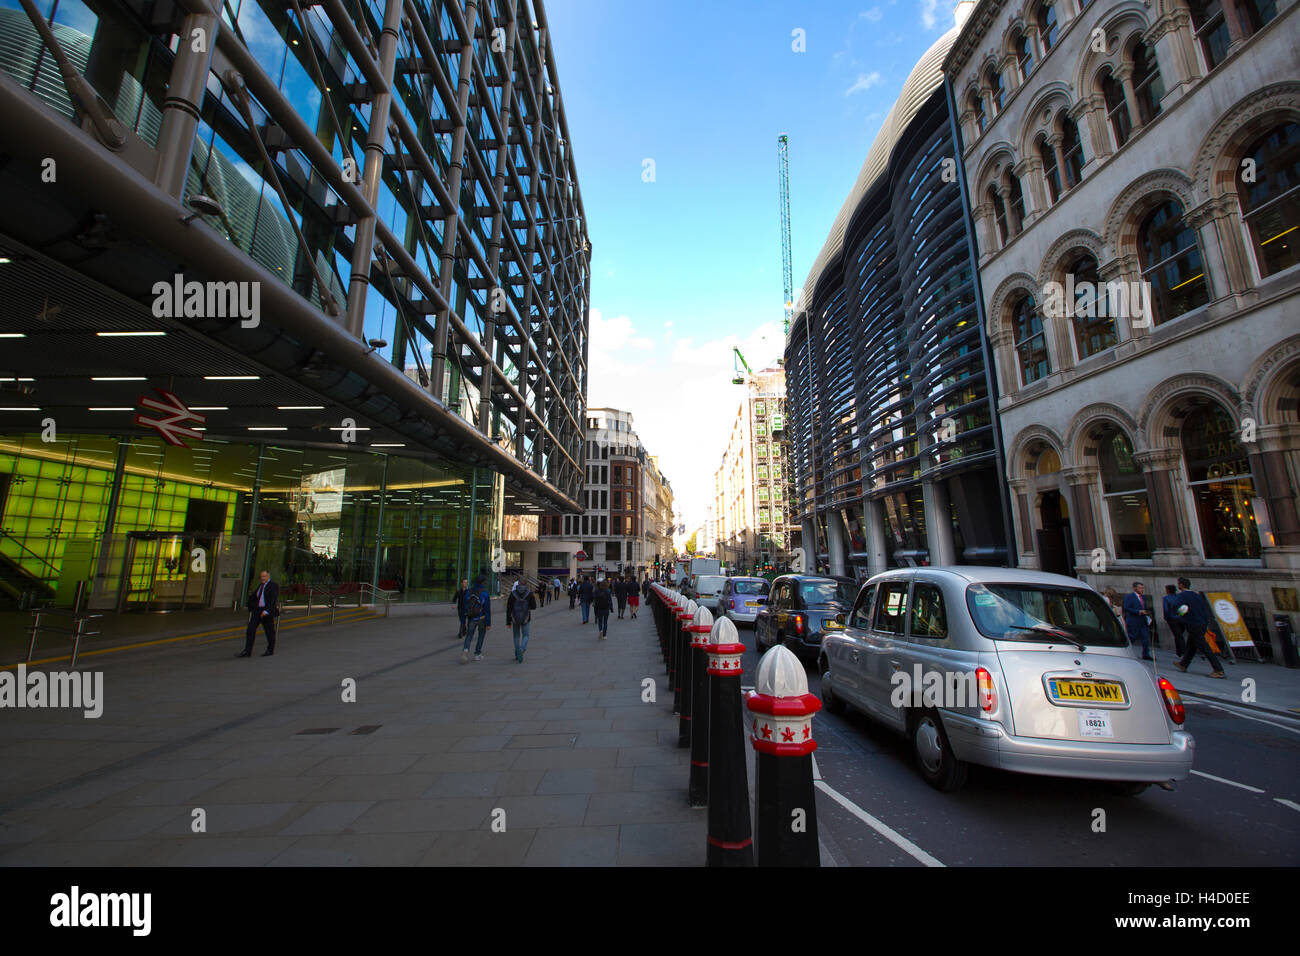 Cannon Street, City of London, England, UK - Stock Image